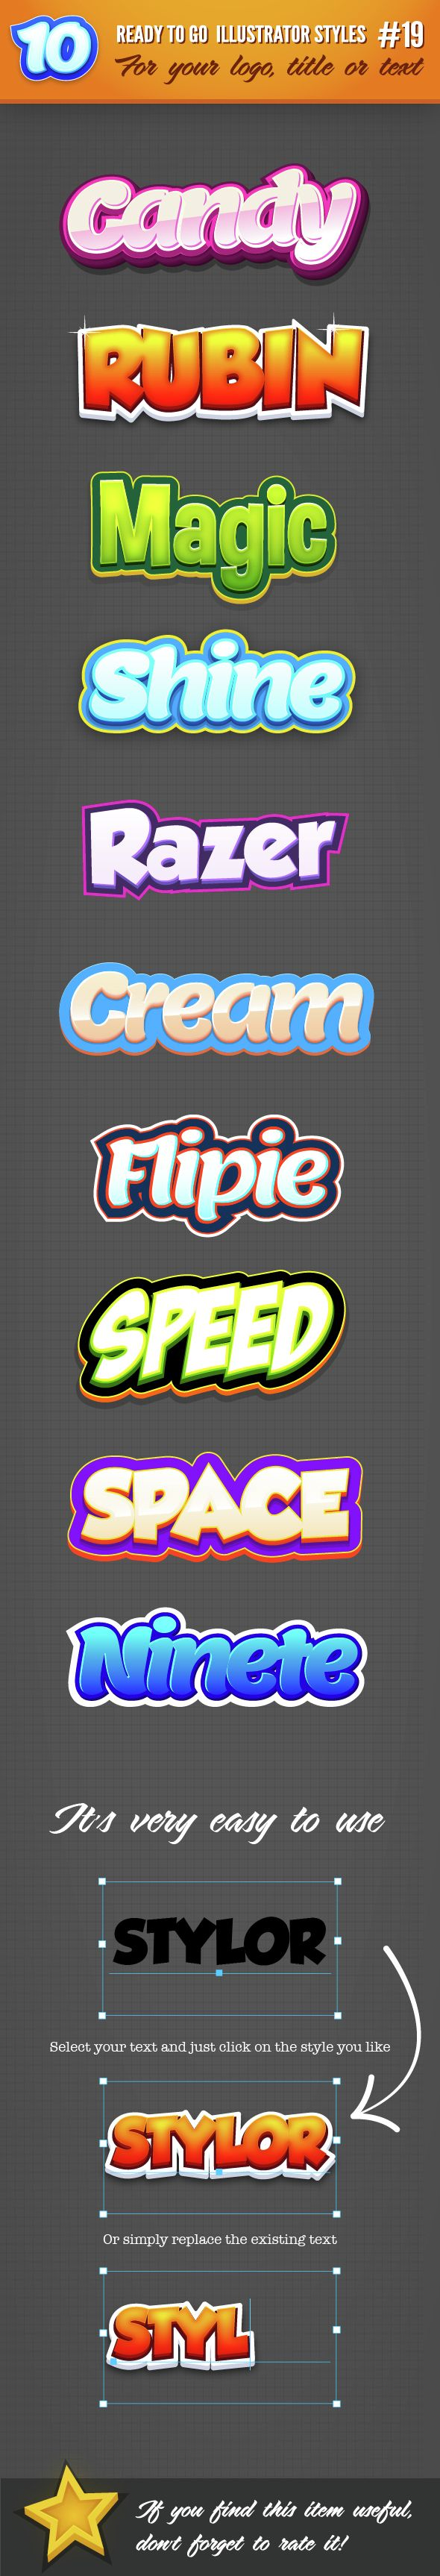 10 Logo Graphic Styles for Adobe Illustrator Download: http://graphicriver.net/item/10-logo-graphic-styles-19/14536668?ref=ksioks